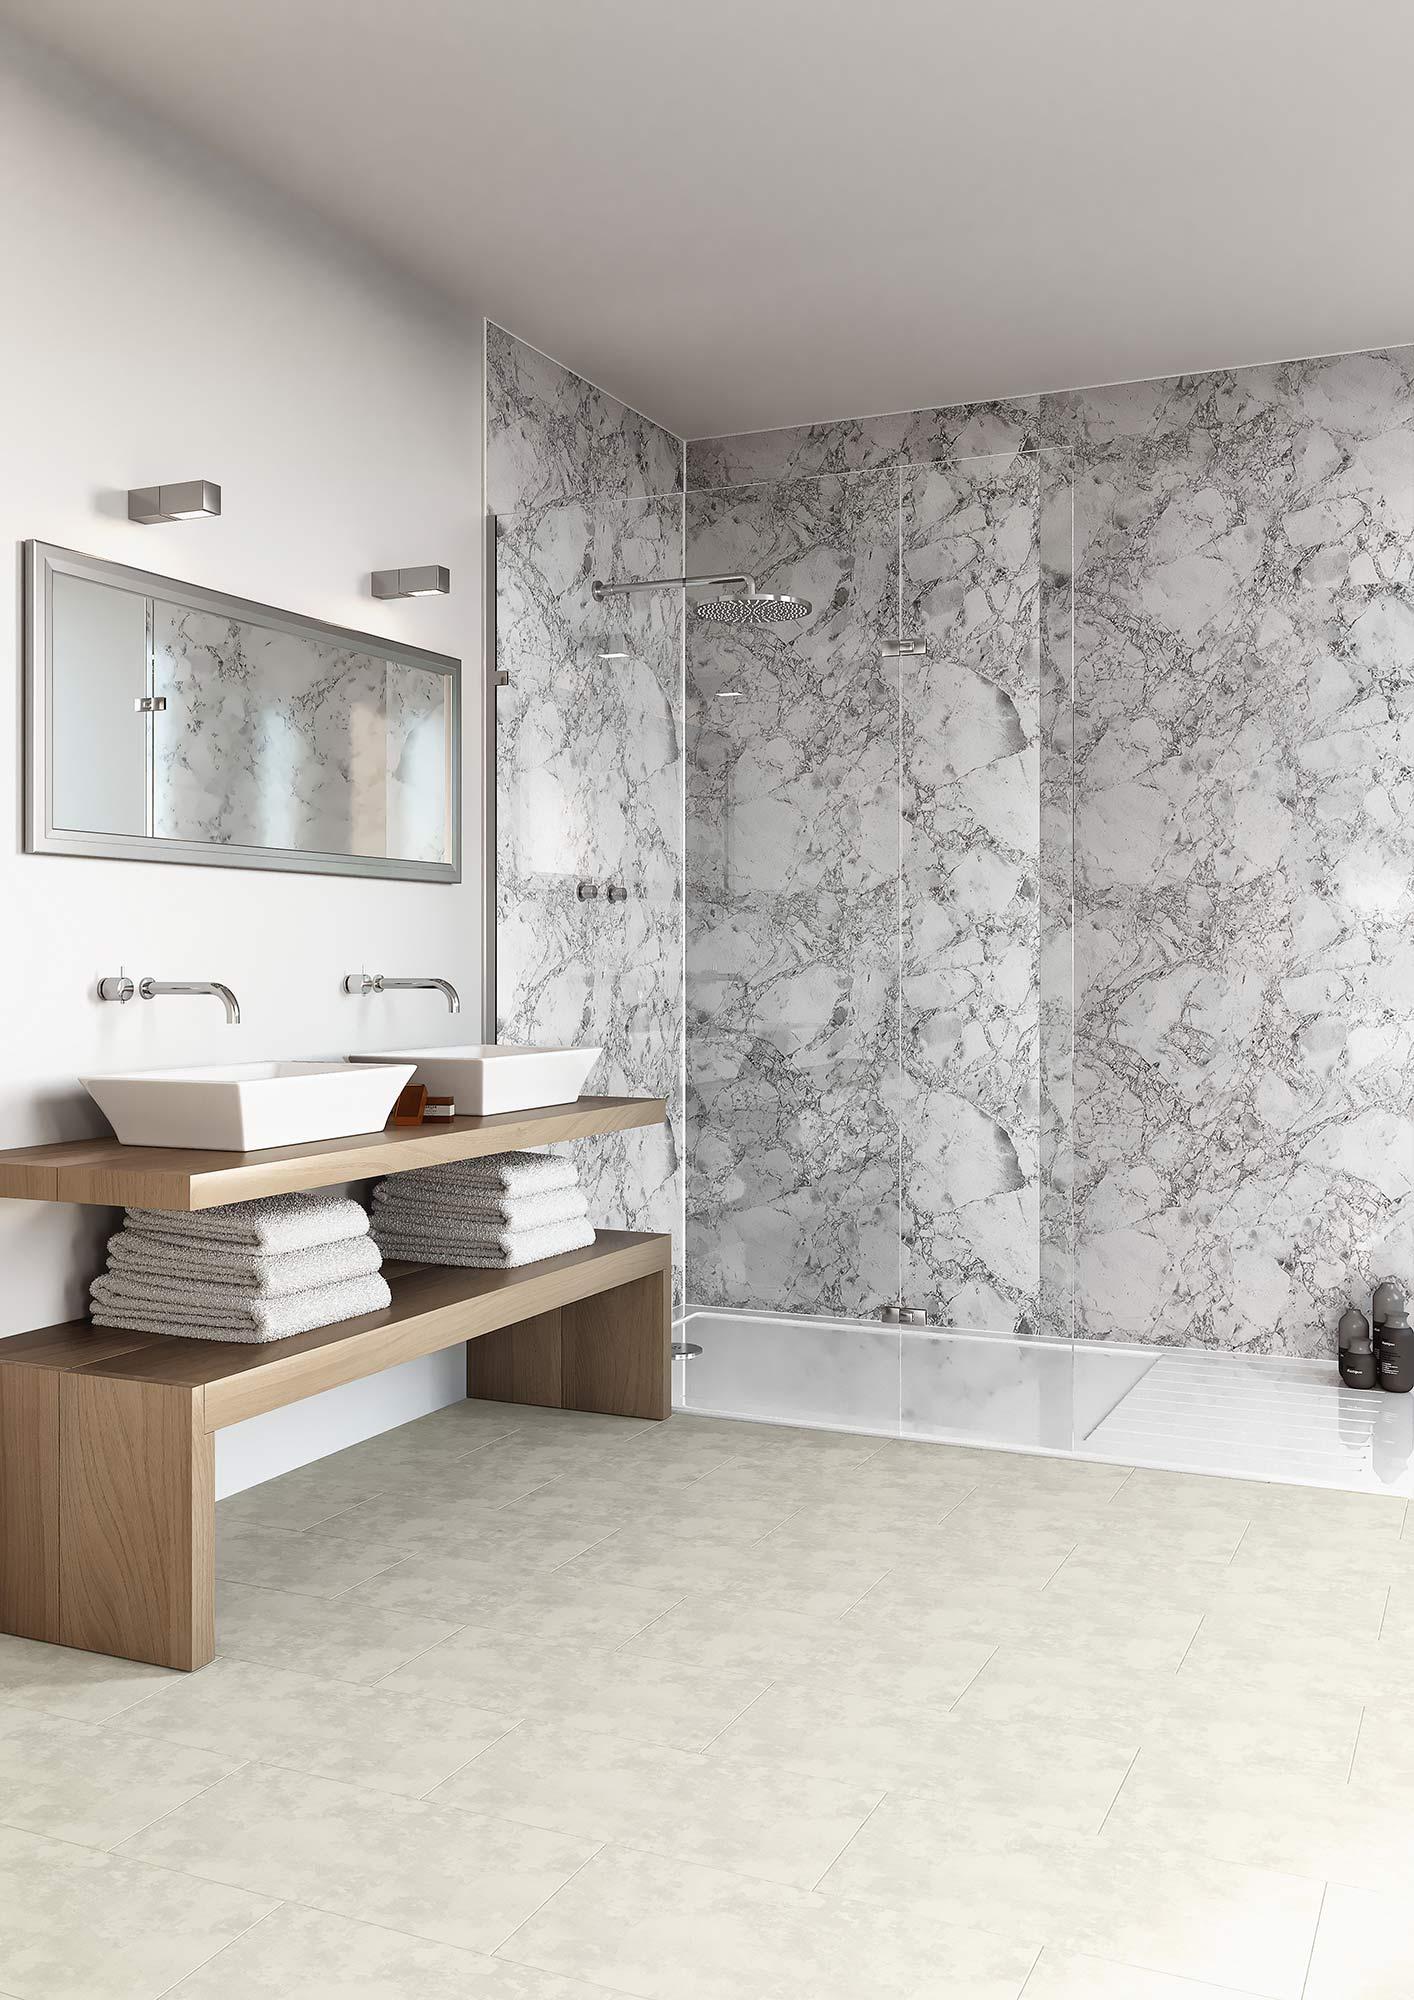 Bathroom Cladding Direct Bathroom Cladding Direct